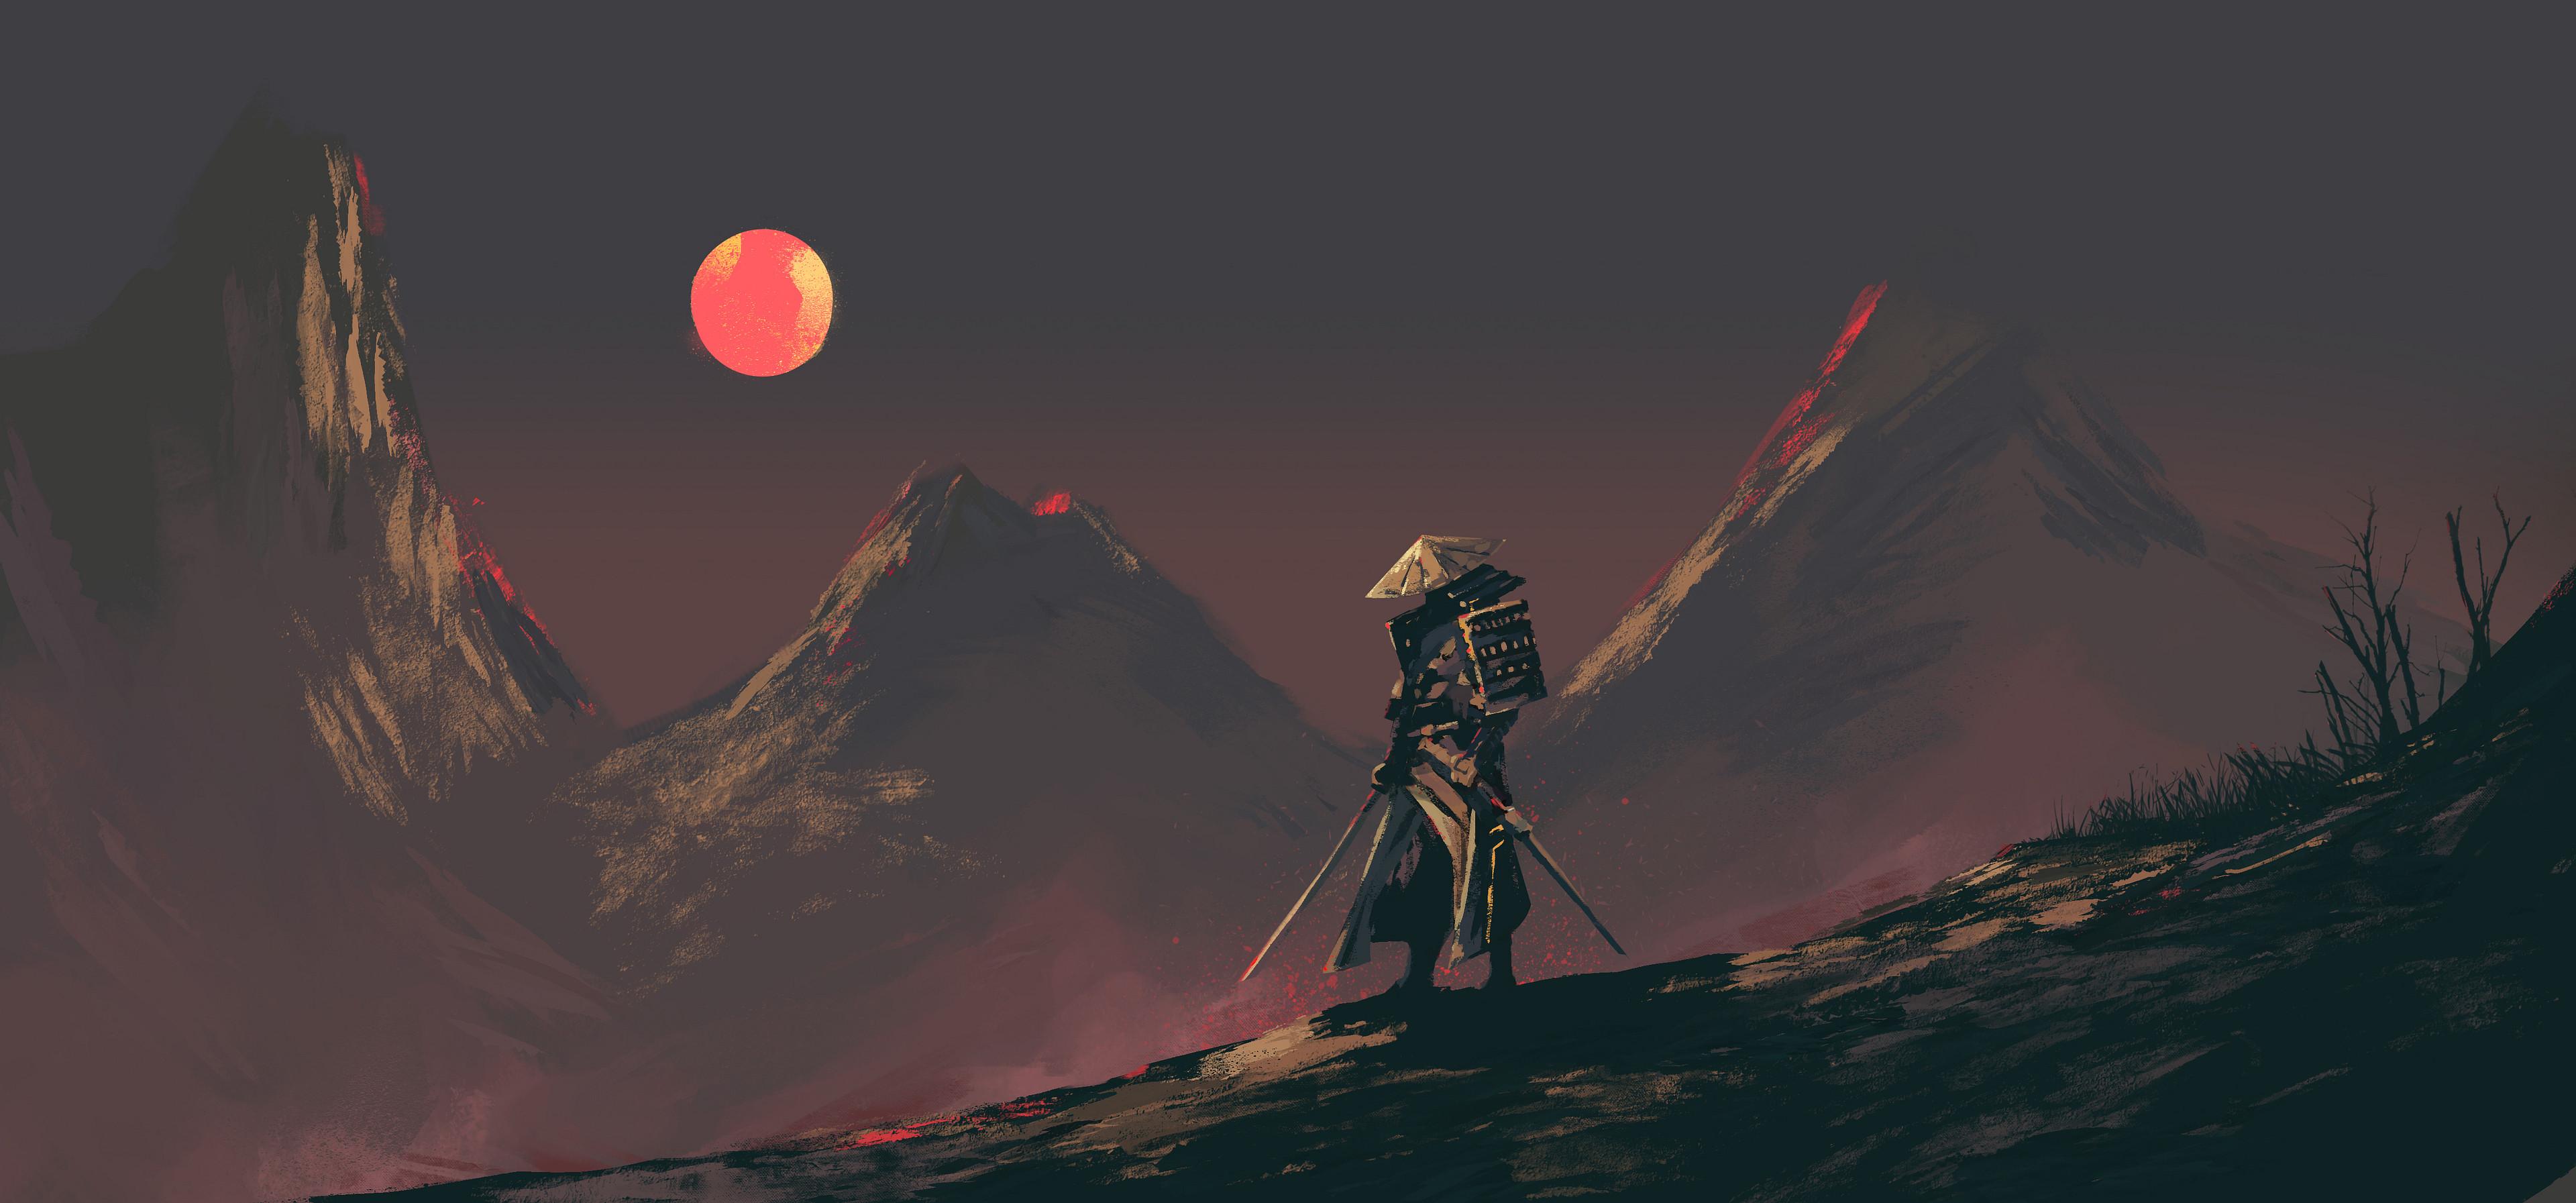 General 3840x1793 digital art landscape samurai Moon mountains night Xavier Cuenca artwork starry night ArtStation sky